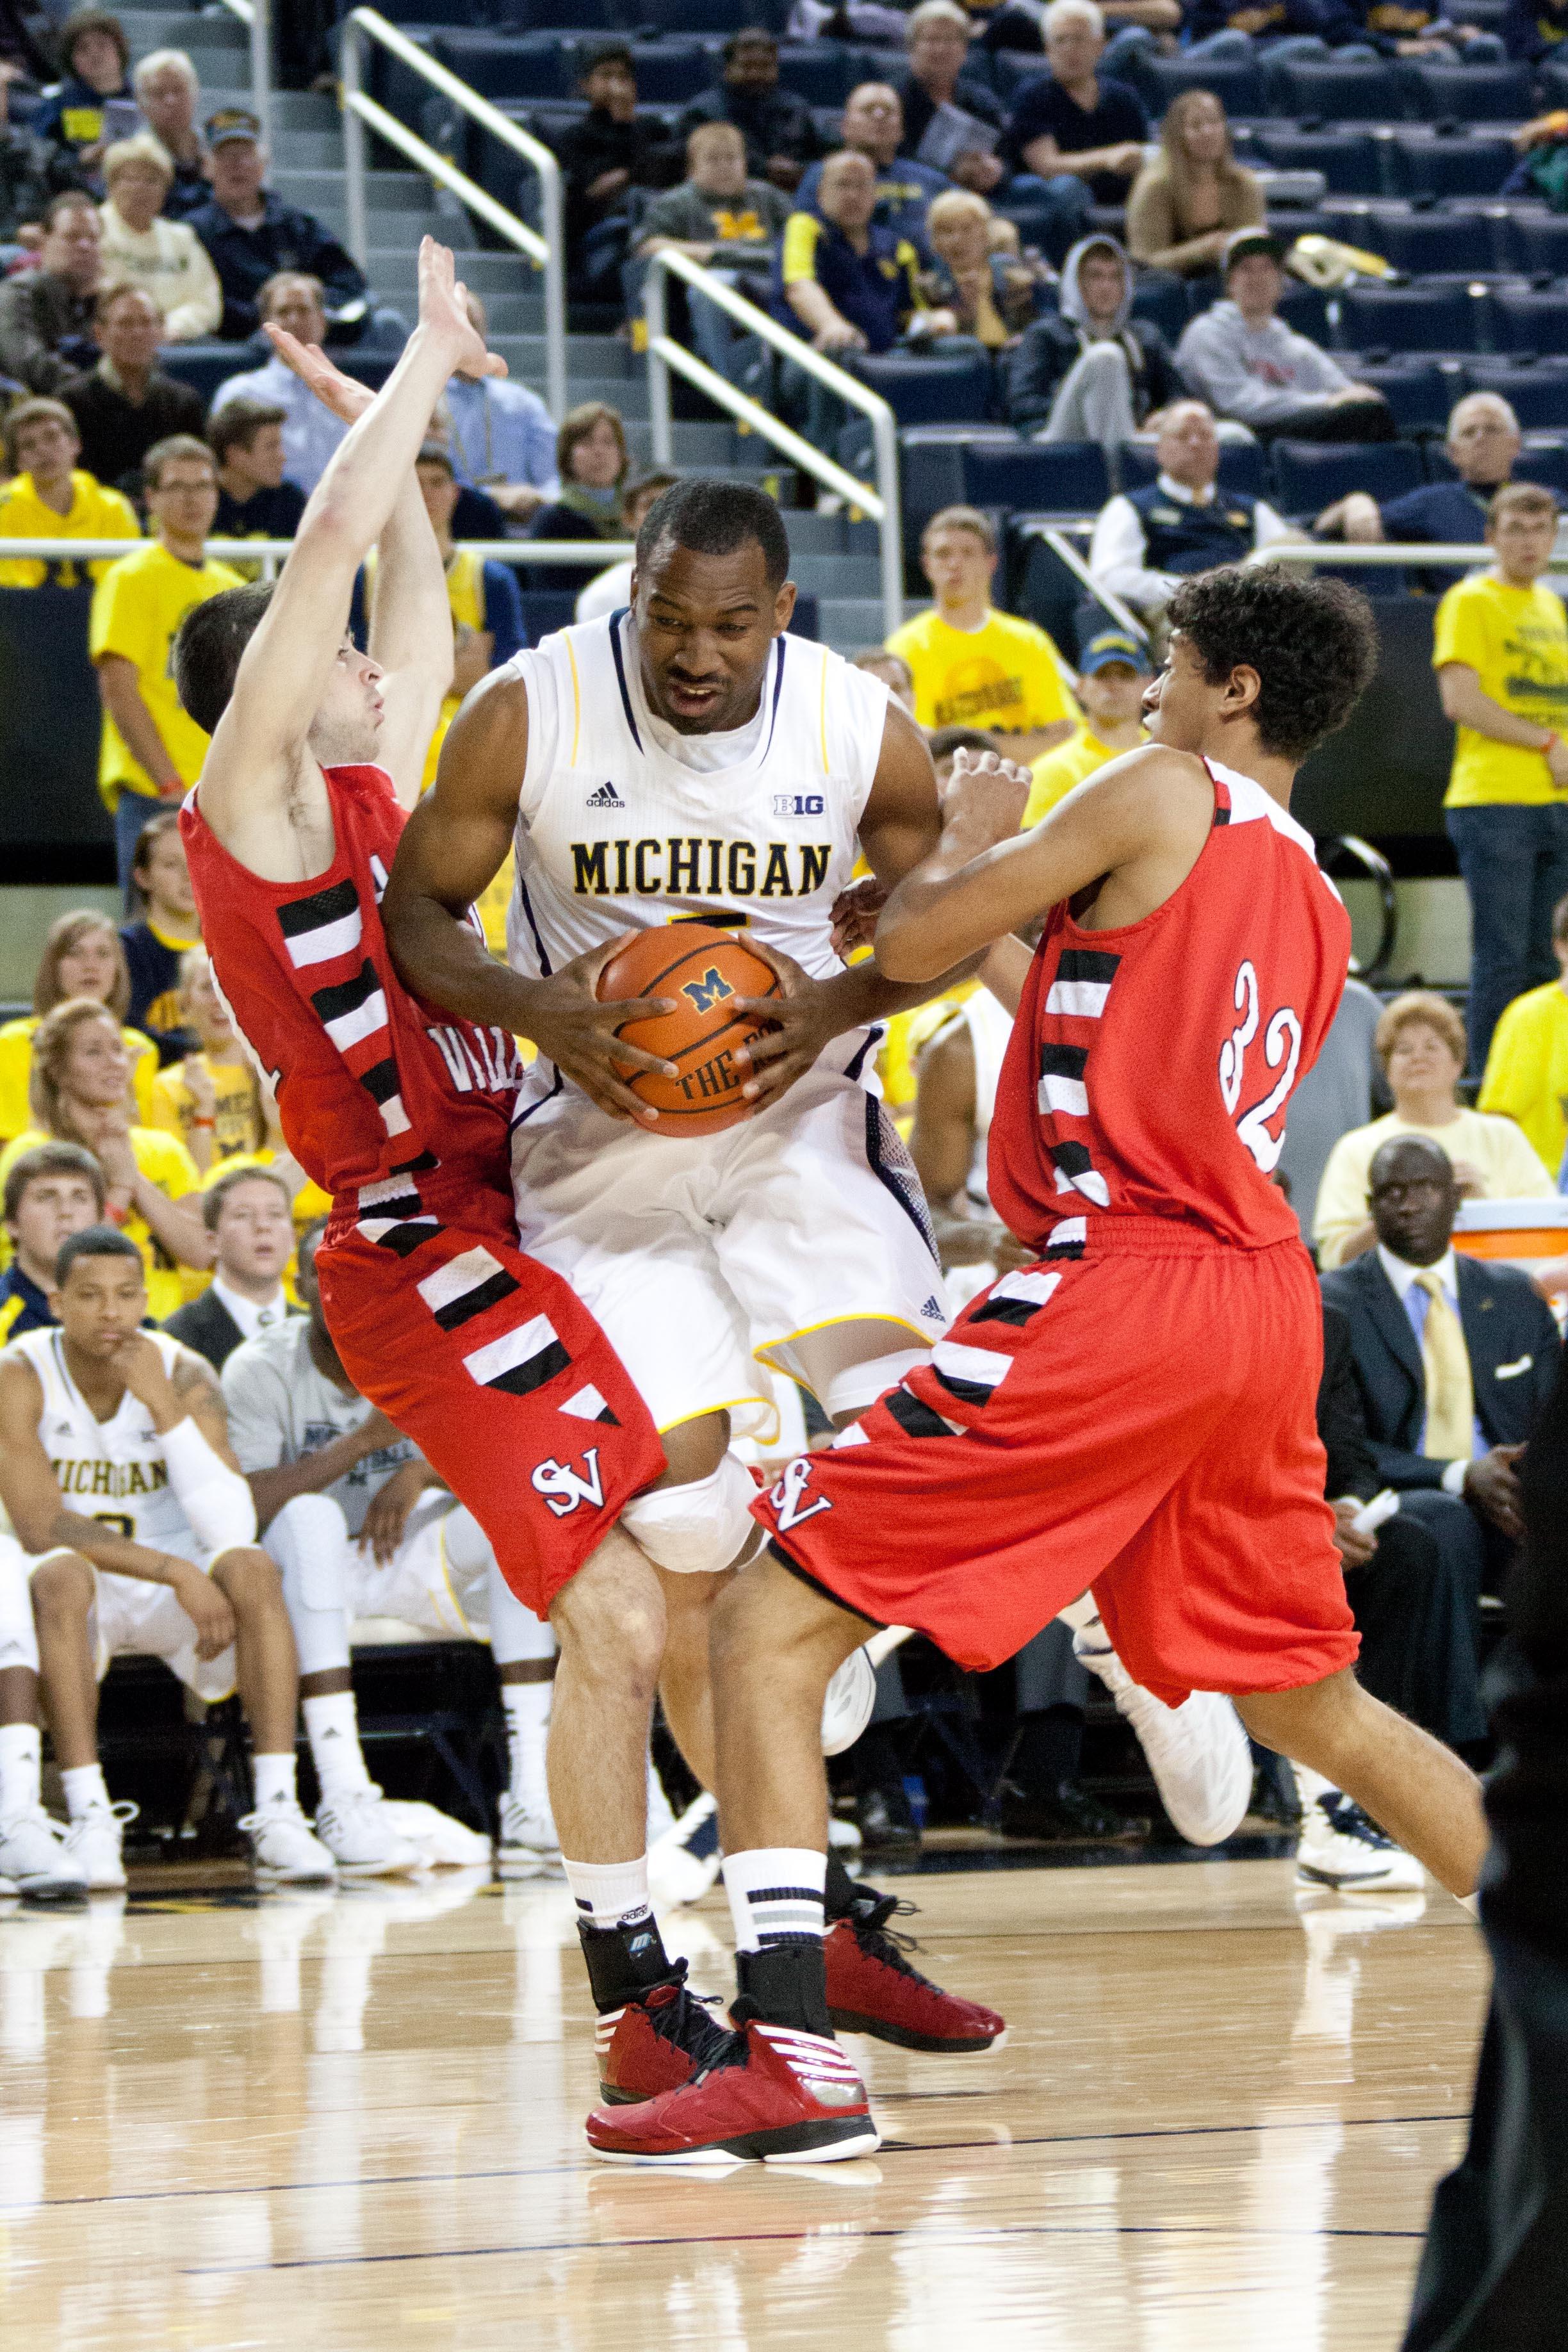 Michigan vs. Saginaw Valley State – 29